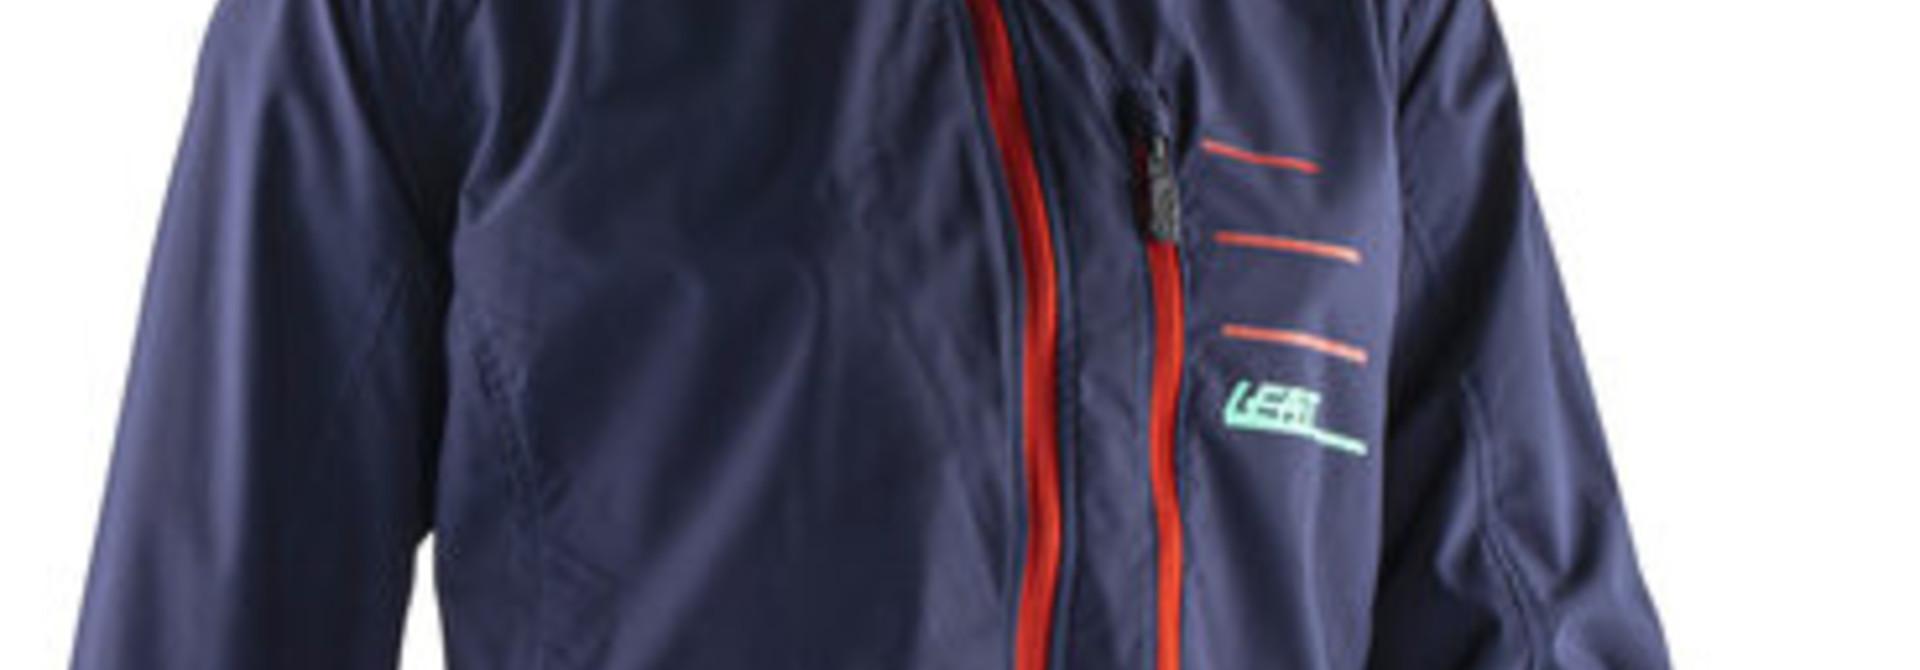 LEATT Apparel Jacket MTB 2.0 Womens Onyx